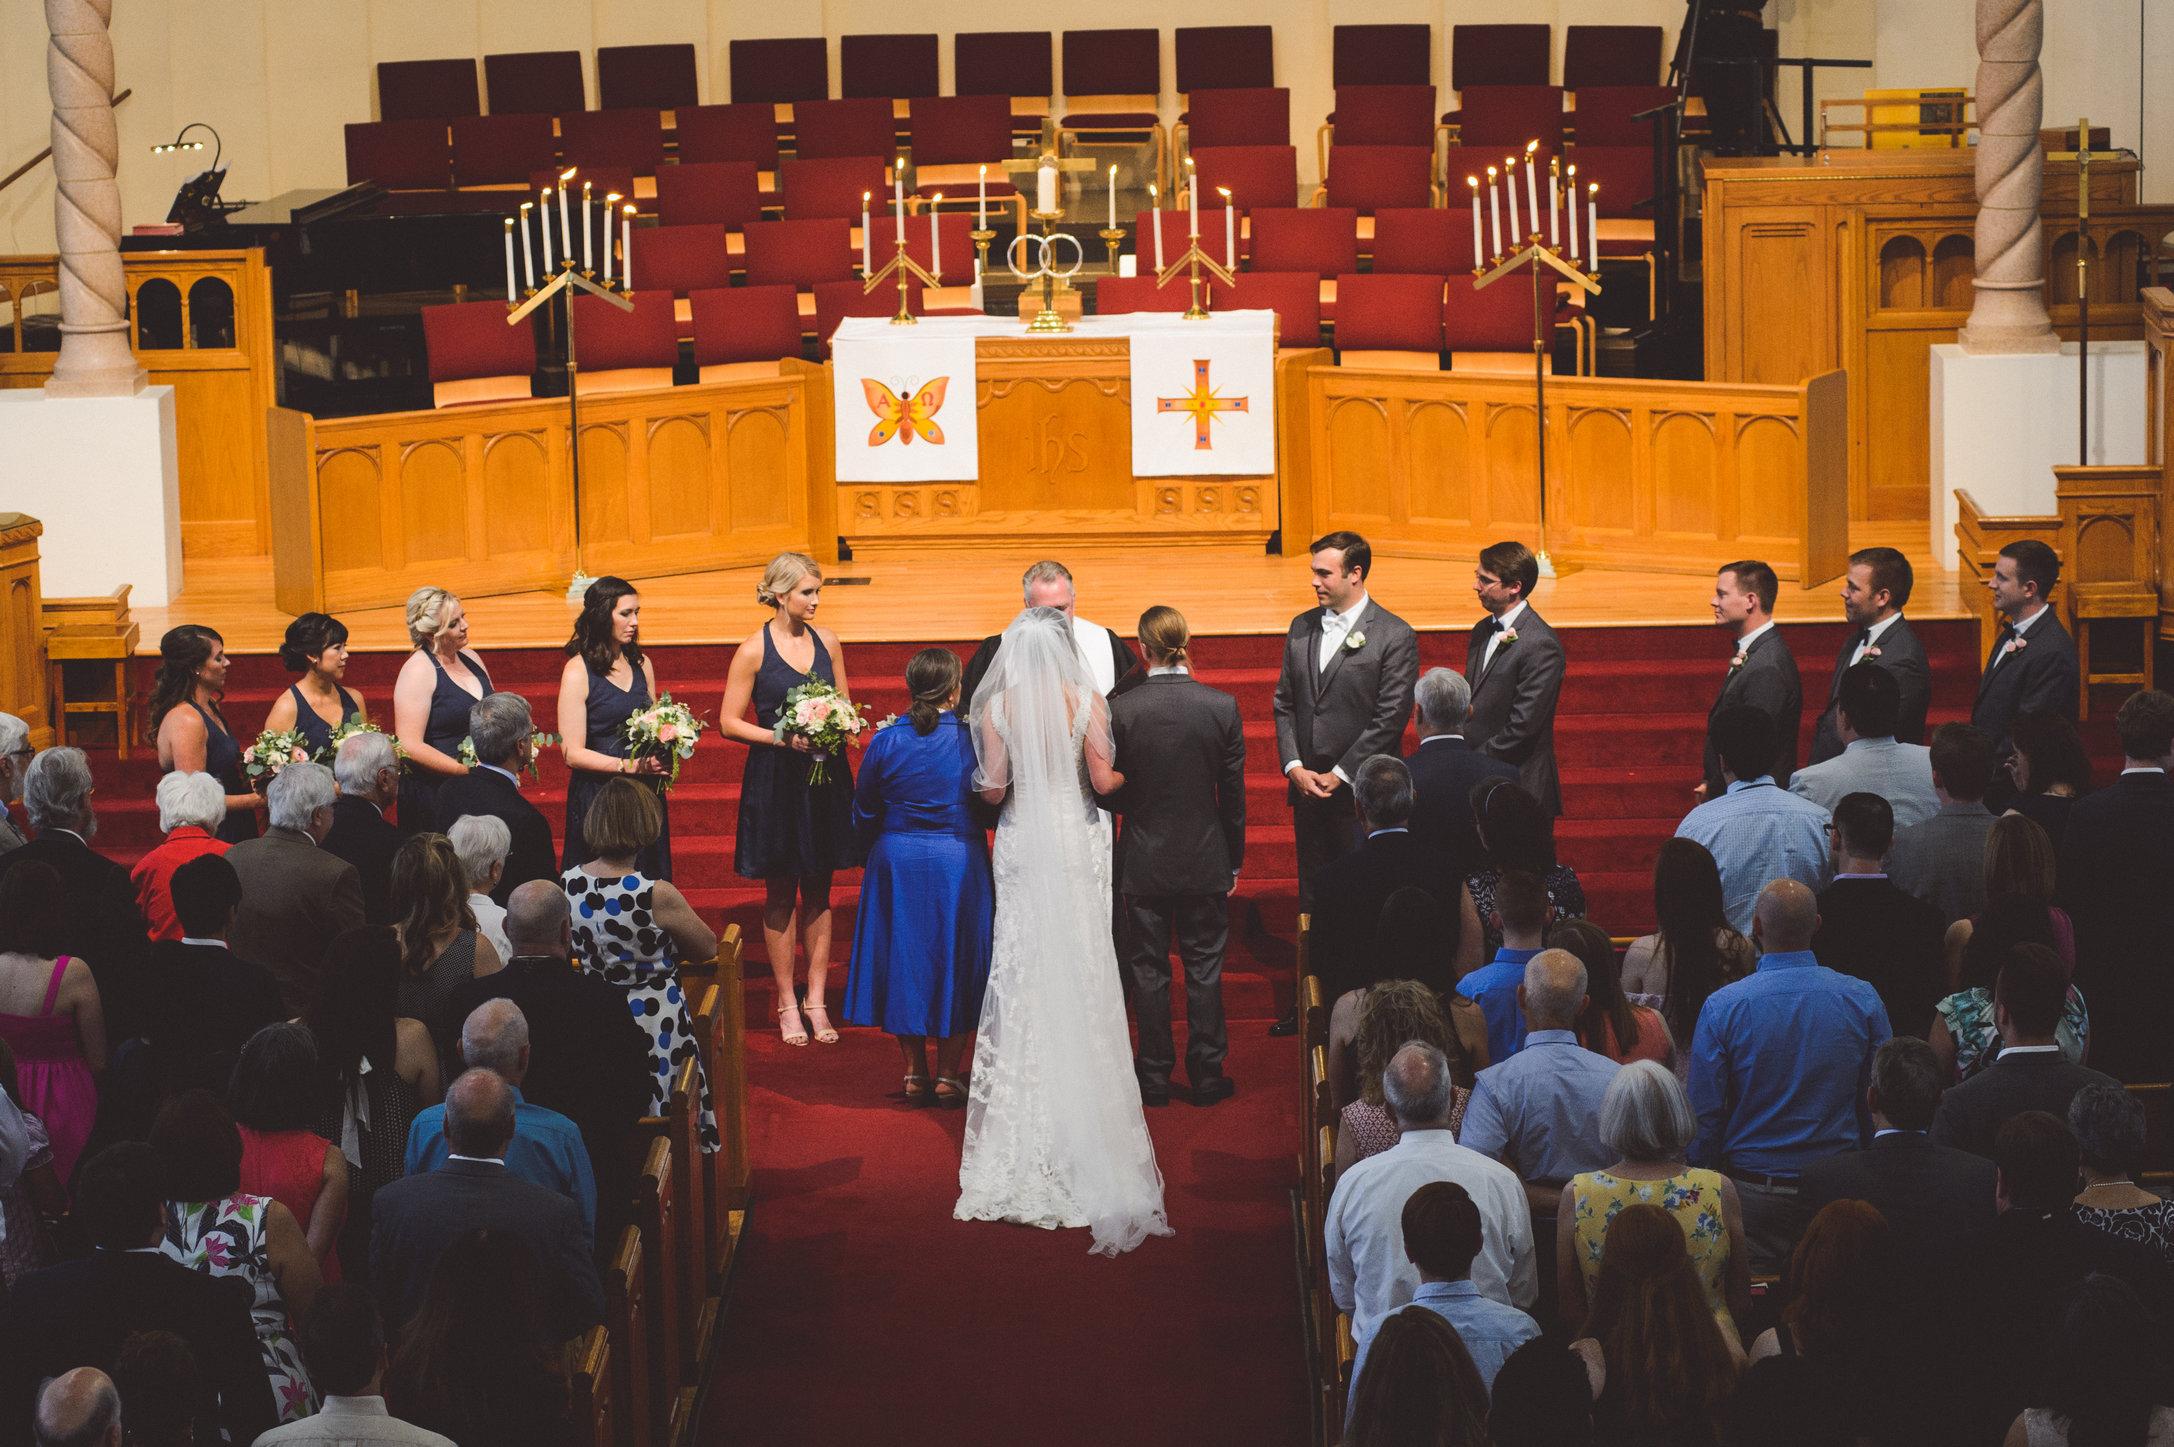 SandC-wedding-174.jpg